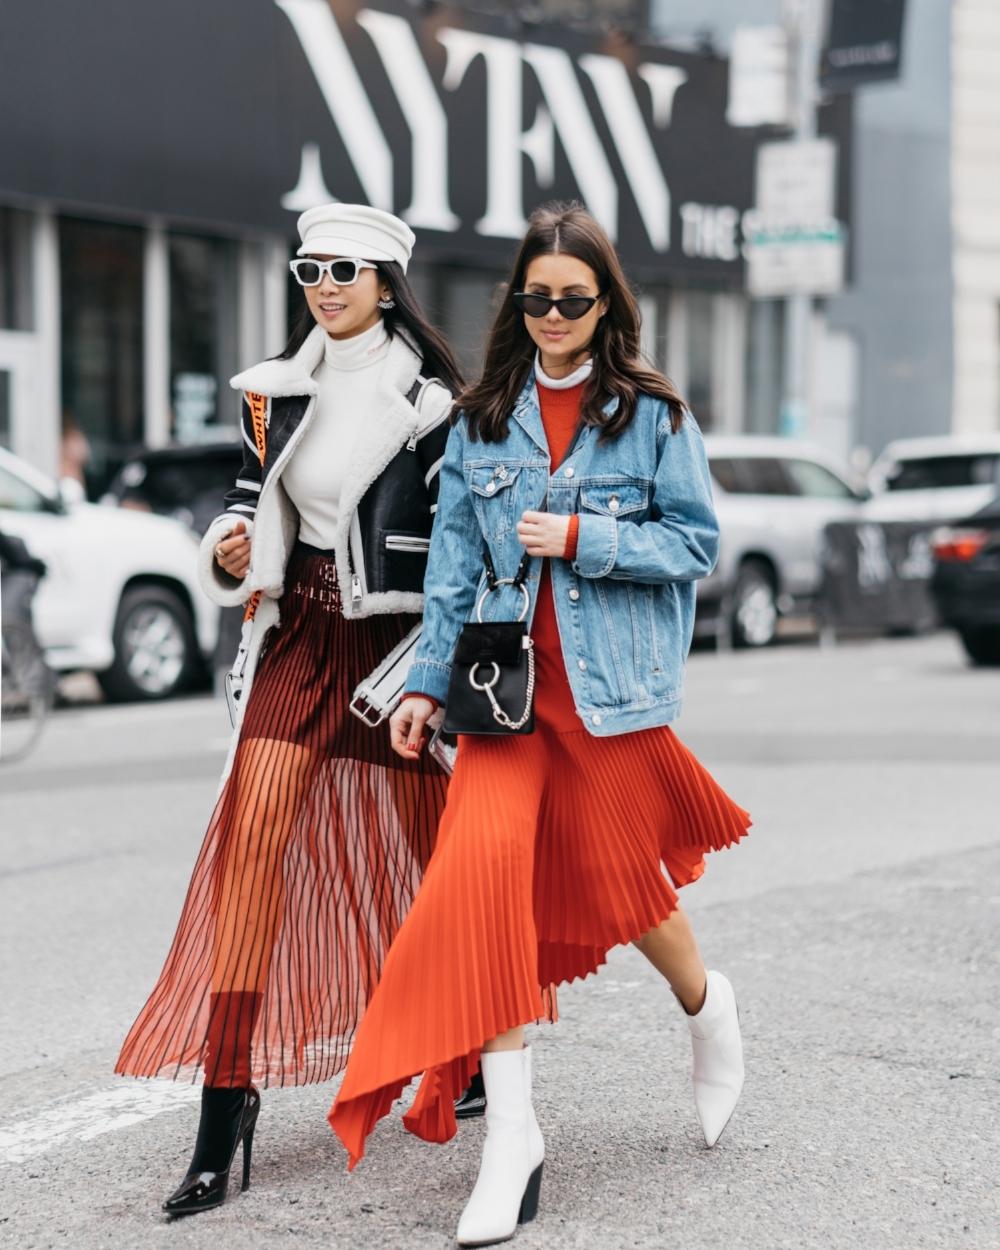 NYFW-FW18-Street-Style-pleated-skirts-Holly-Sarah